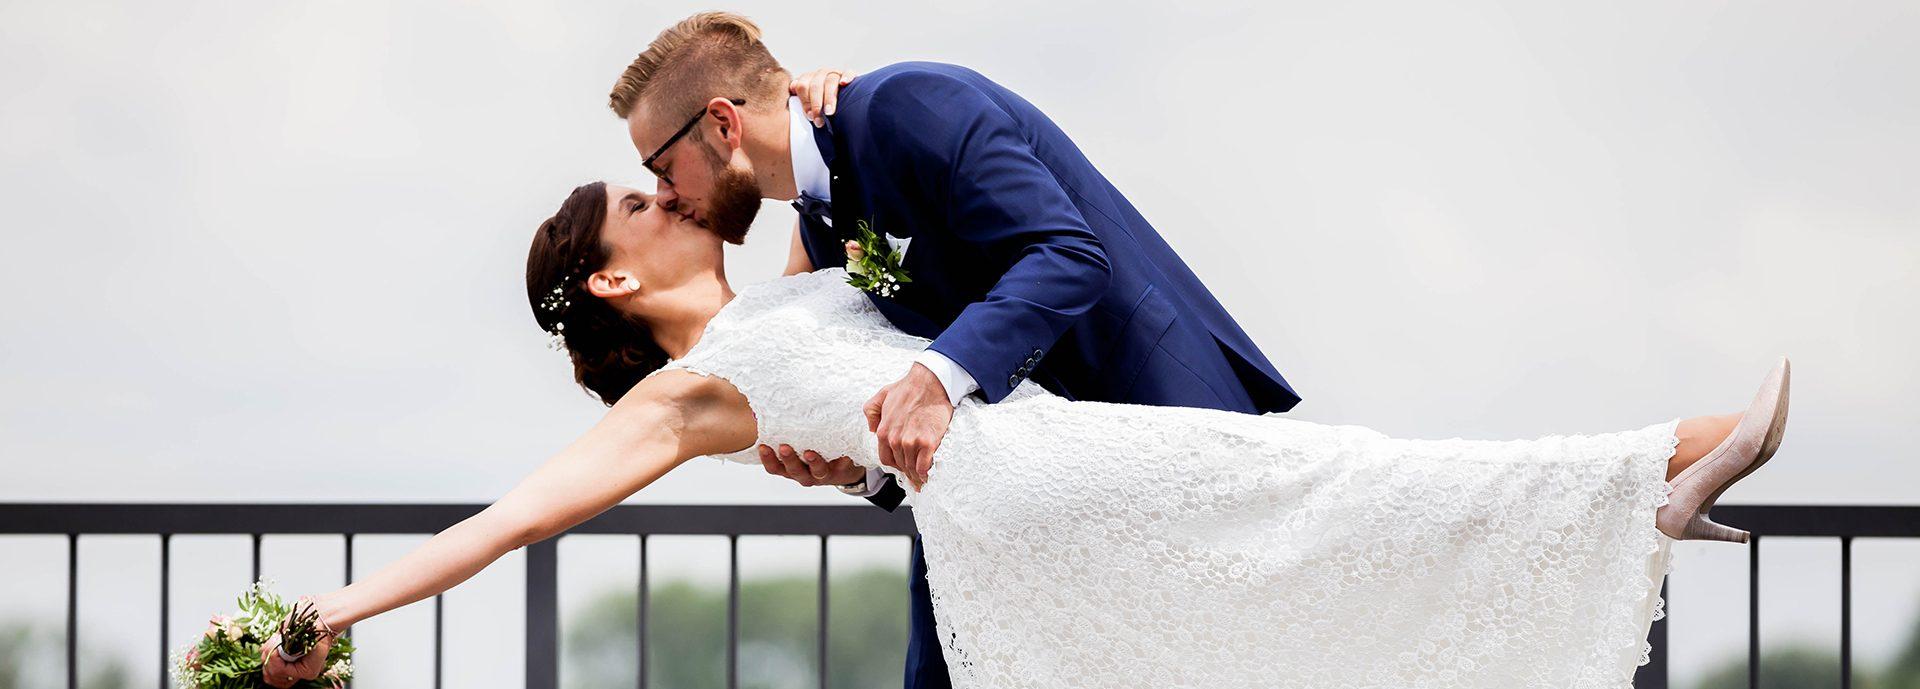 Hochzeitsfotograf aus Kassel & Videograf Tel.: 0176/303 591 27 Büro:0561/5037 6040